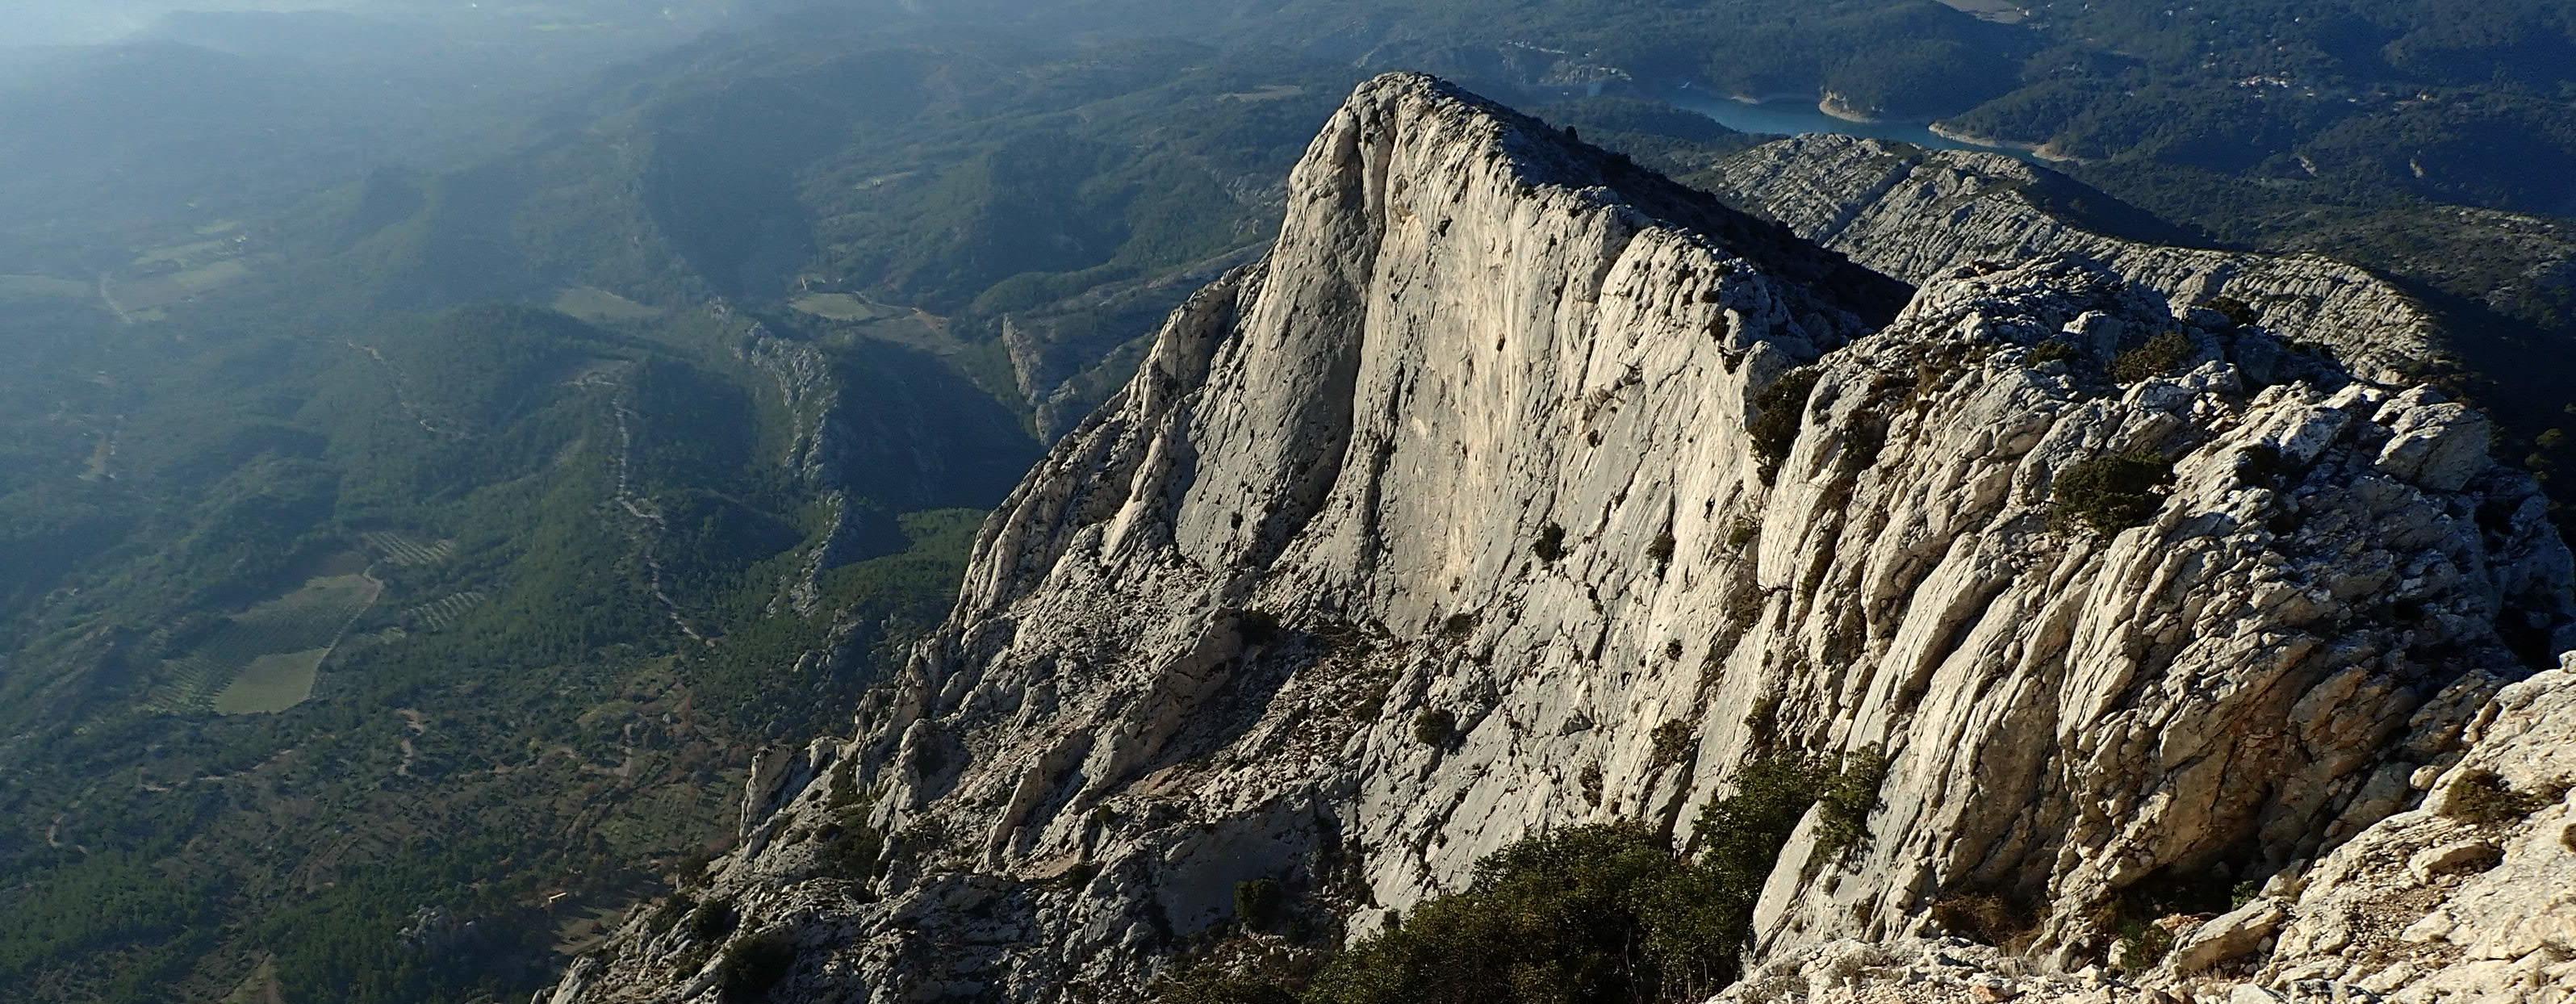 Rando escalade sur sainte victoire pr s d 39 aix en provence - The camp aix en provence ...